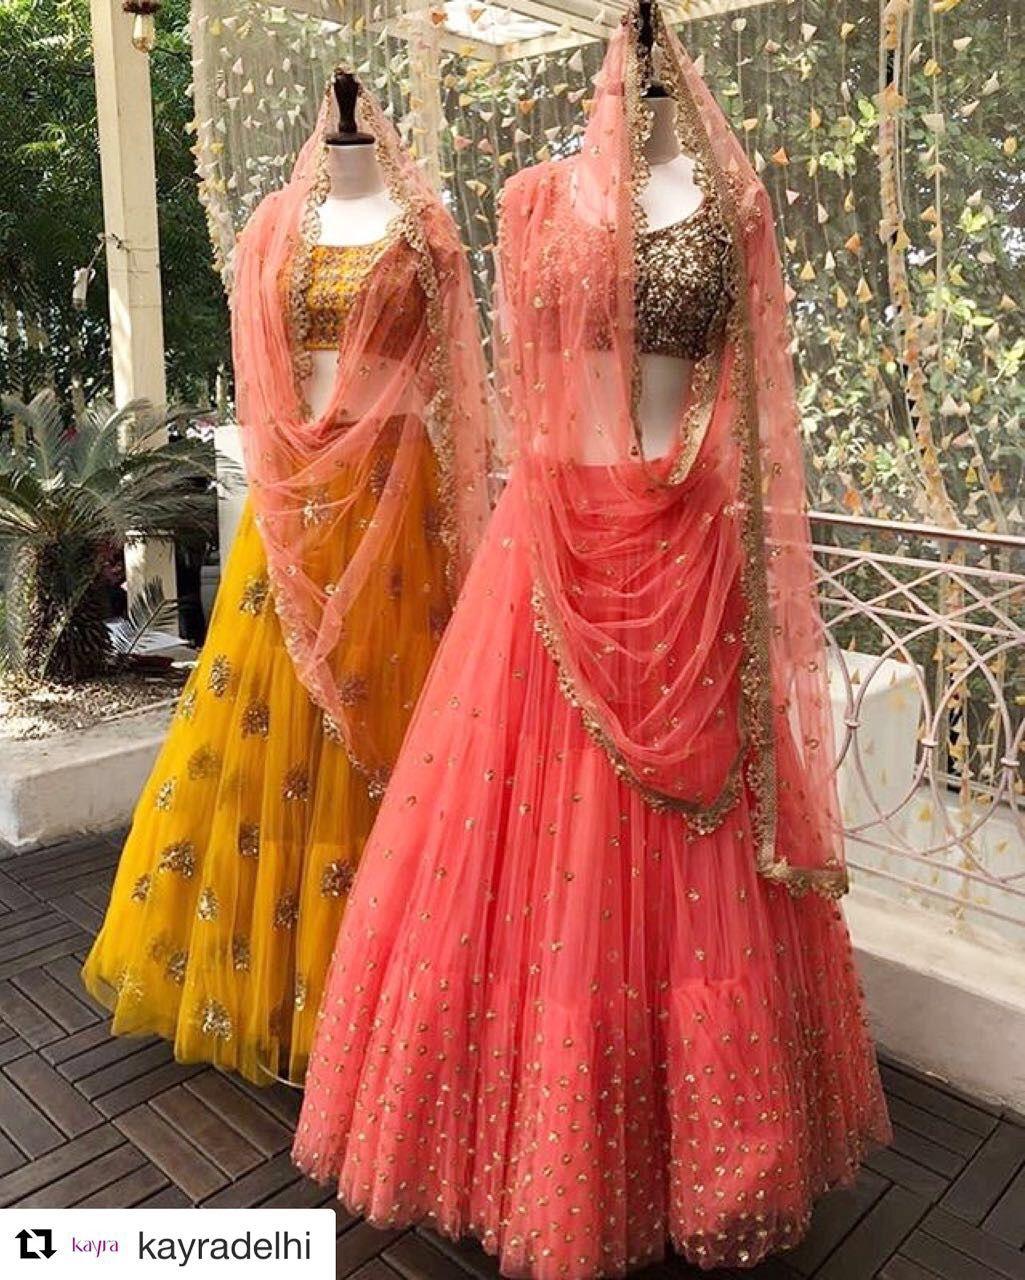 dbb7576ab1 Meenakshi By Mrunalini Rao Contact: +91 7032083620 Indian Lehenga, Lehenga  Choli, Sari